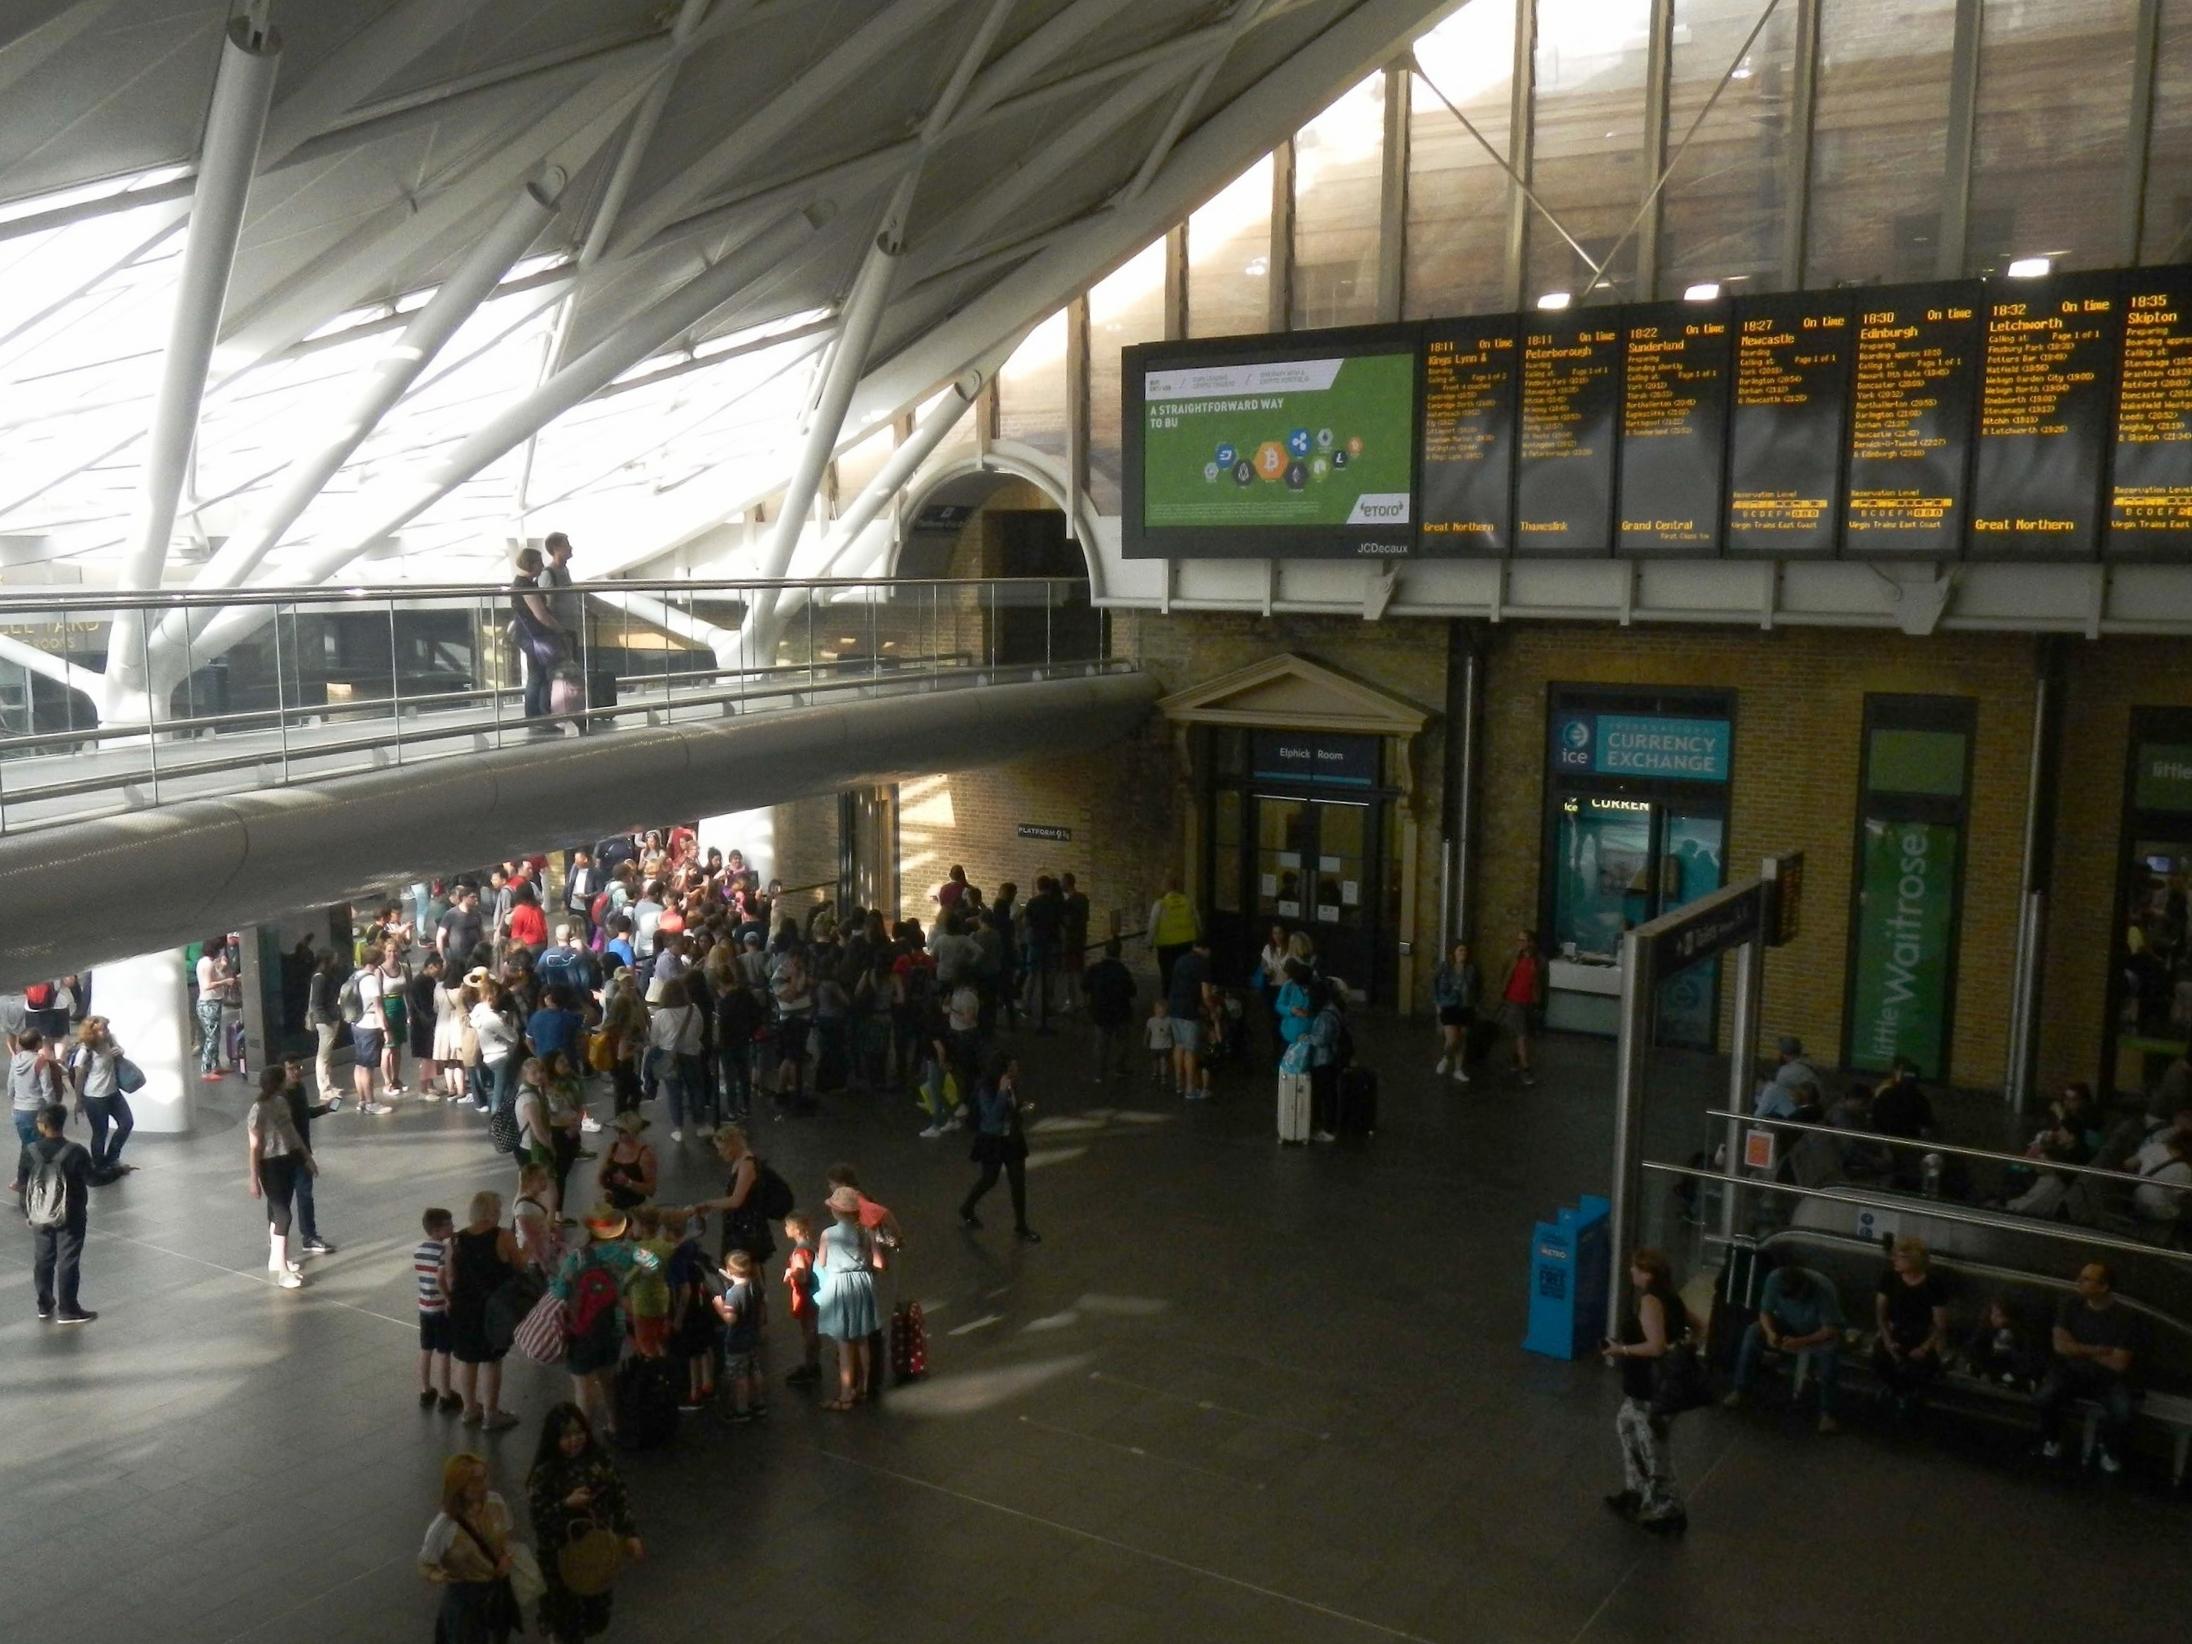 Platform 9-3/4 at King's Cross